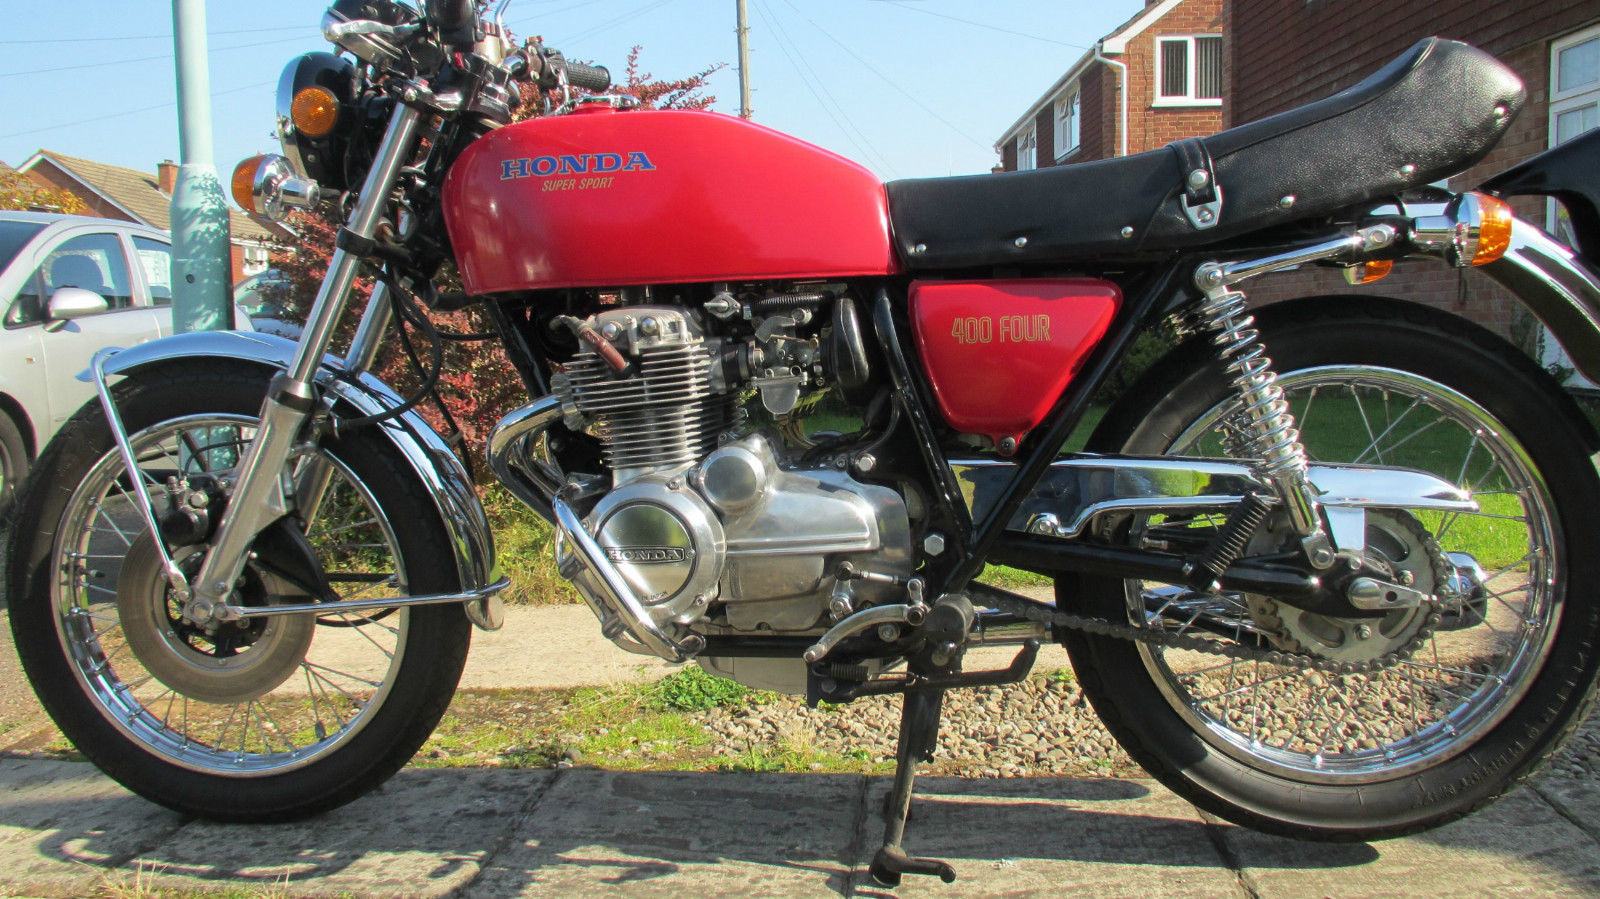 Restored honda cb400 4 1976 photographs at classic bikes for Honda cb400 for sale